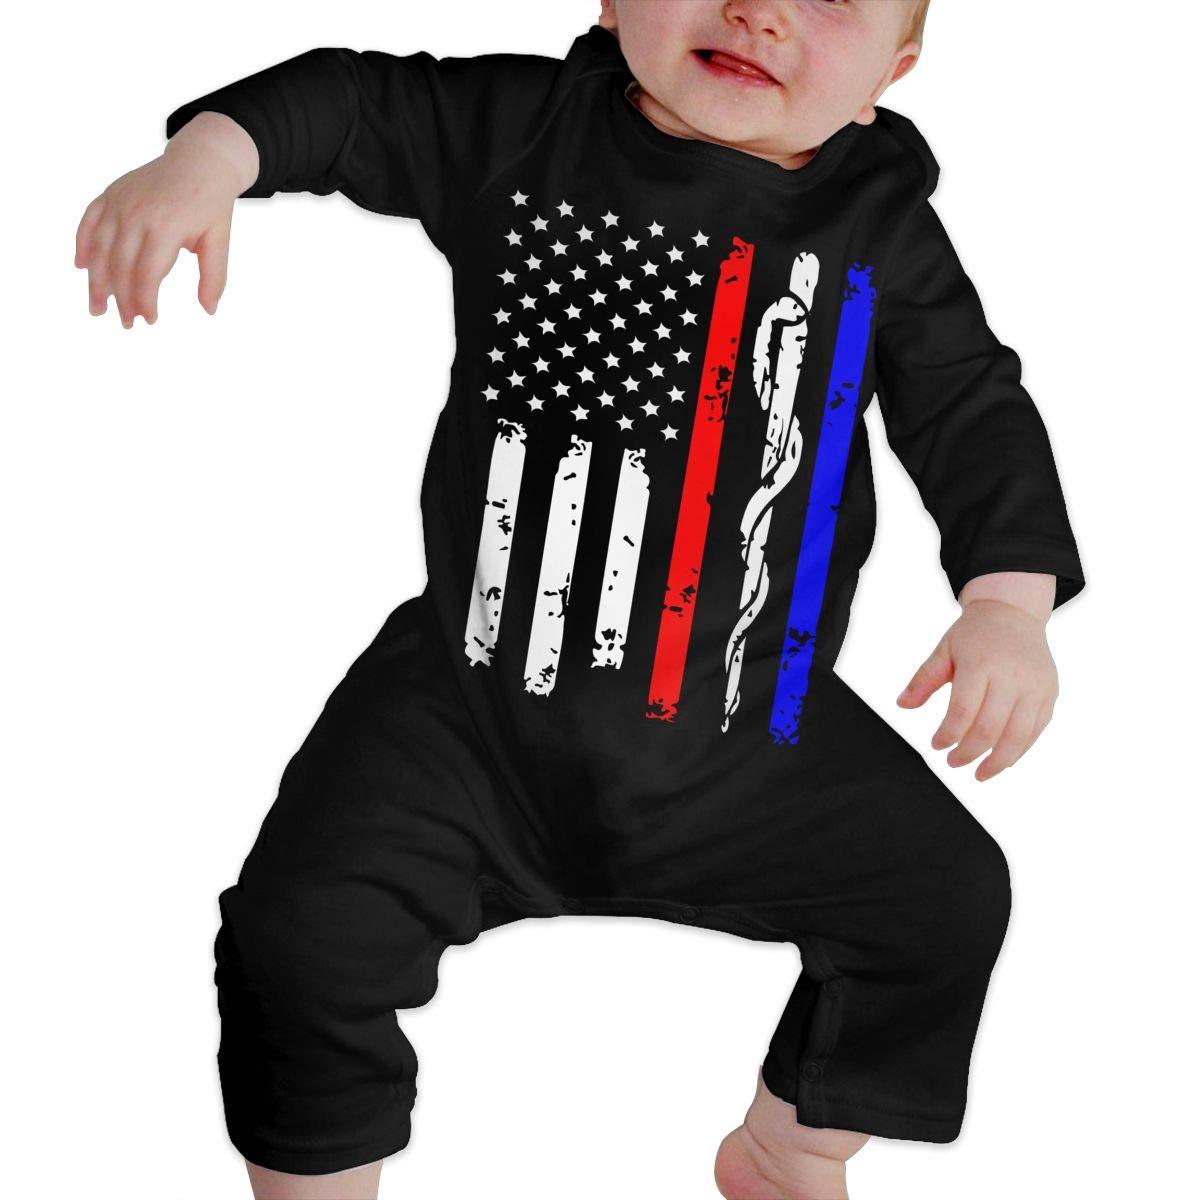 YUE--3BODY Police /& Firefighter /& EMT Flag Toddler Baby Boy Girl Long Sleeve Gentleman Bodysuit